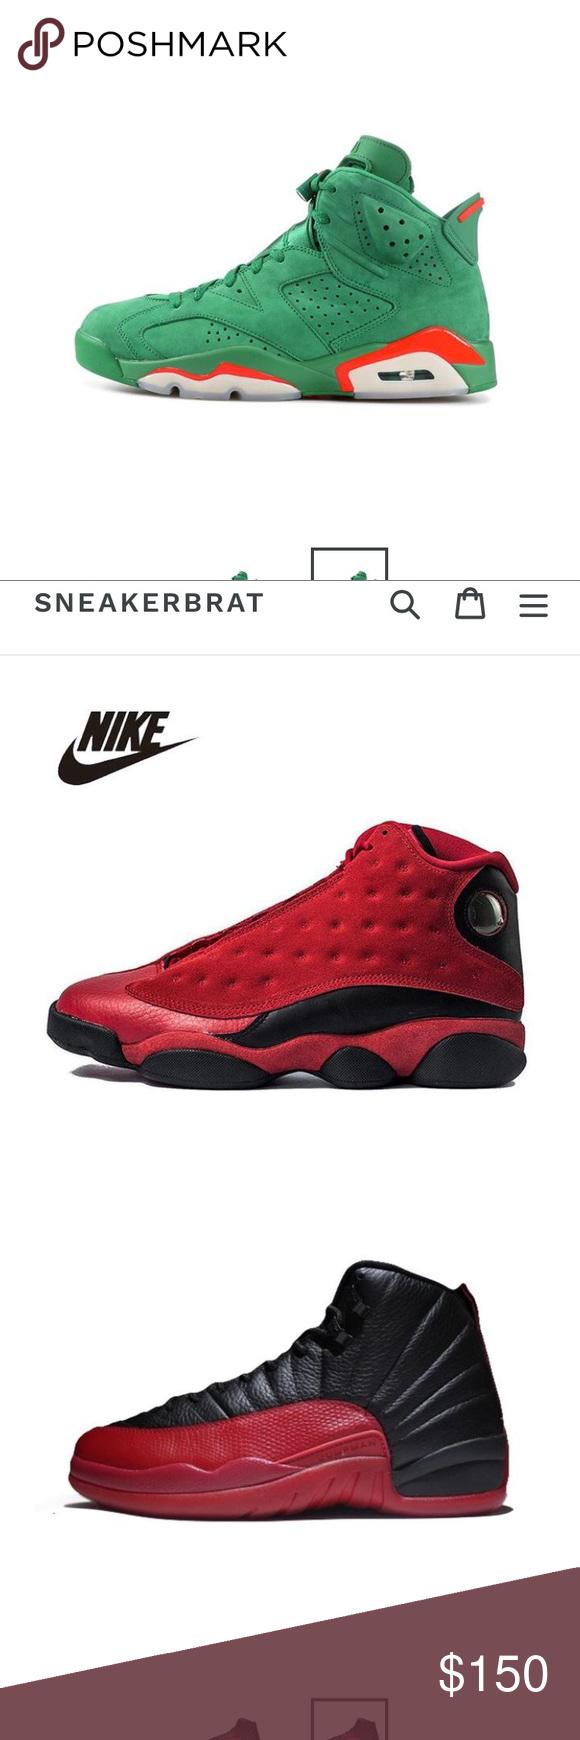 Jordan Retro Order online only! No